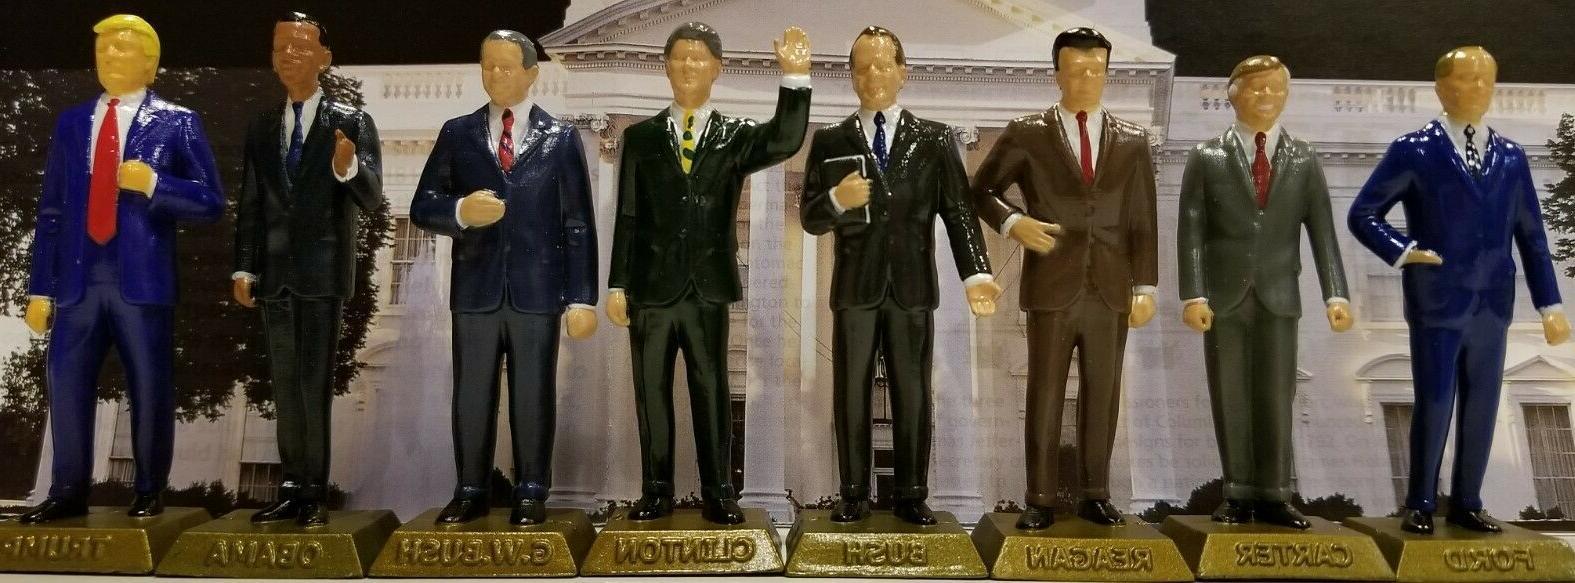 the eight u s president figurines never